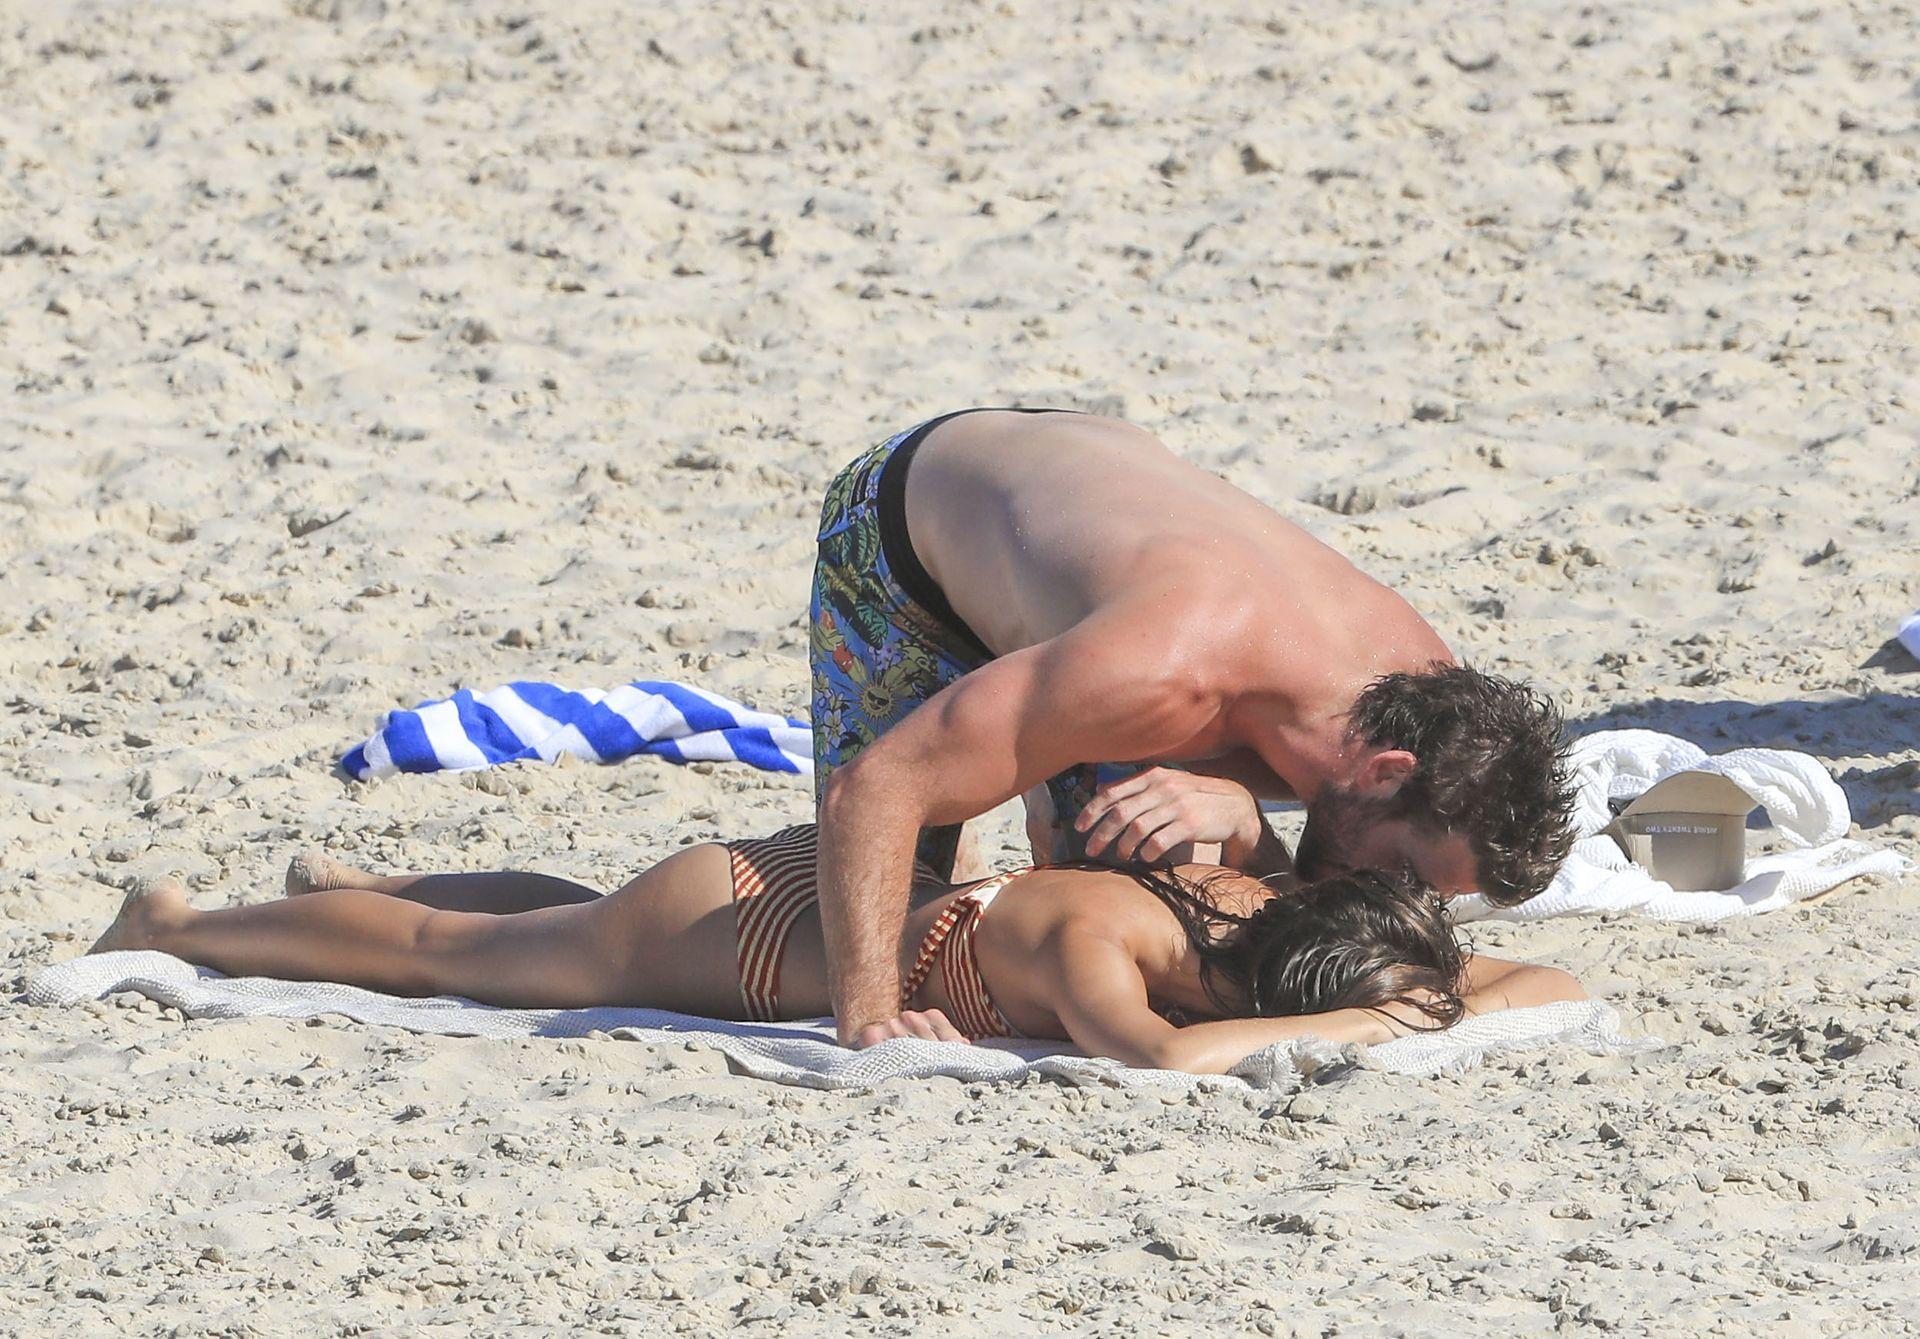 Gabriella Brooks Hot – Liam Hemsworth's New Girlfriend 0022